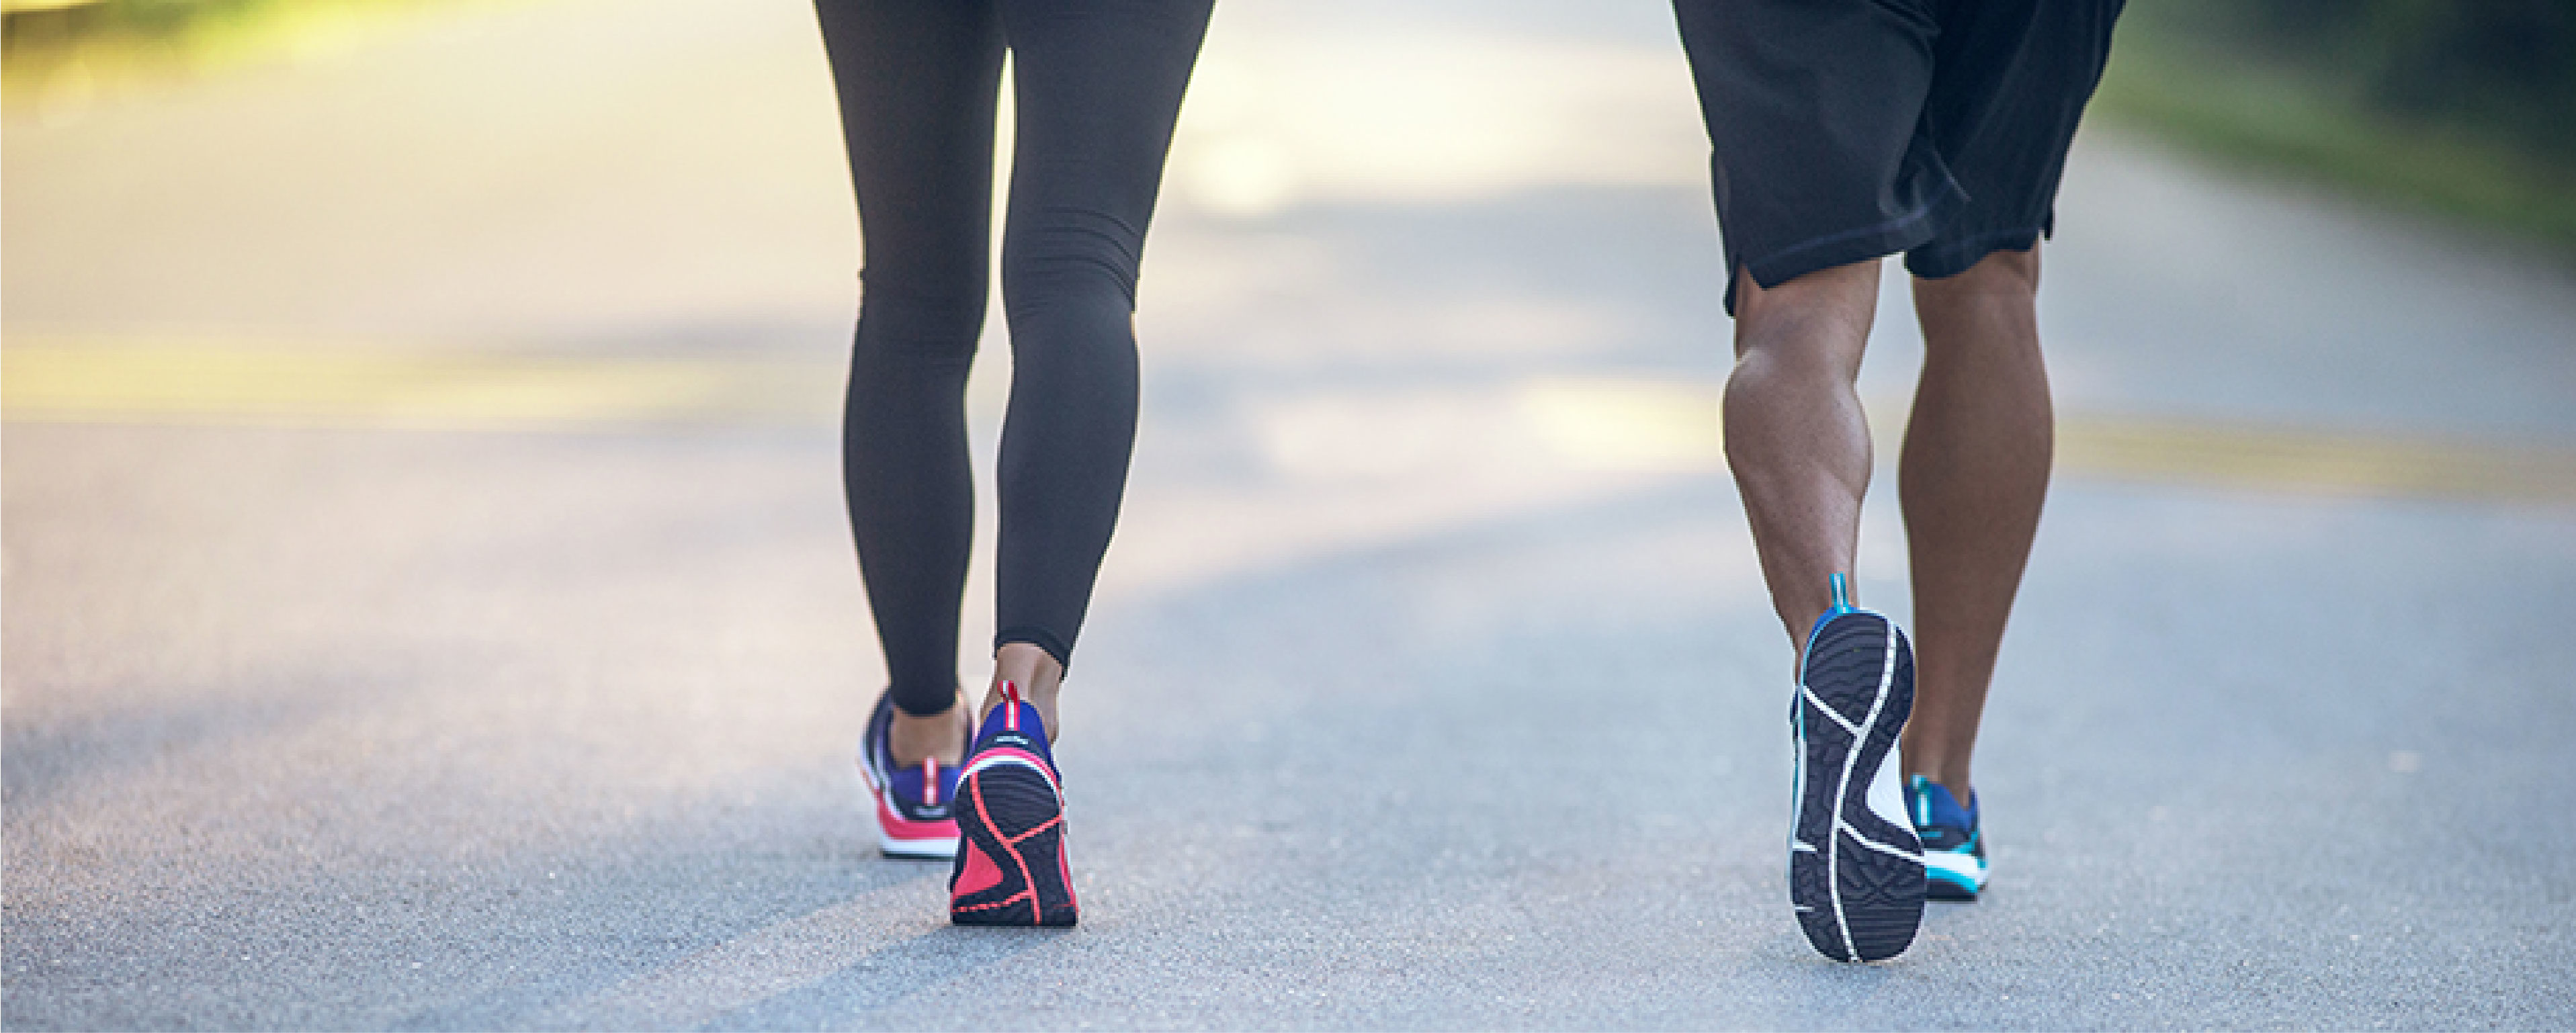 chaussures_marche_active